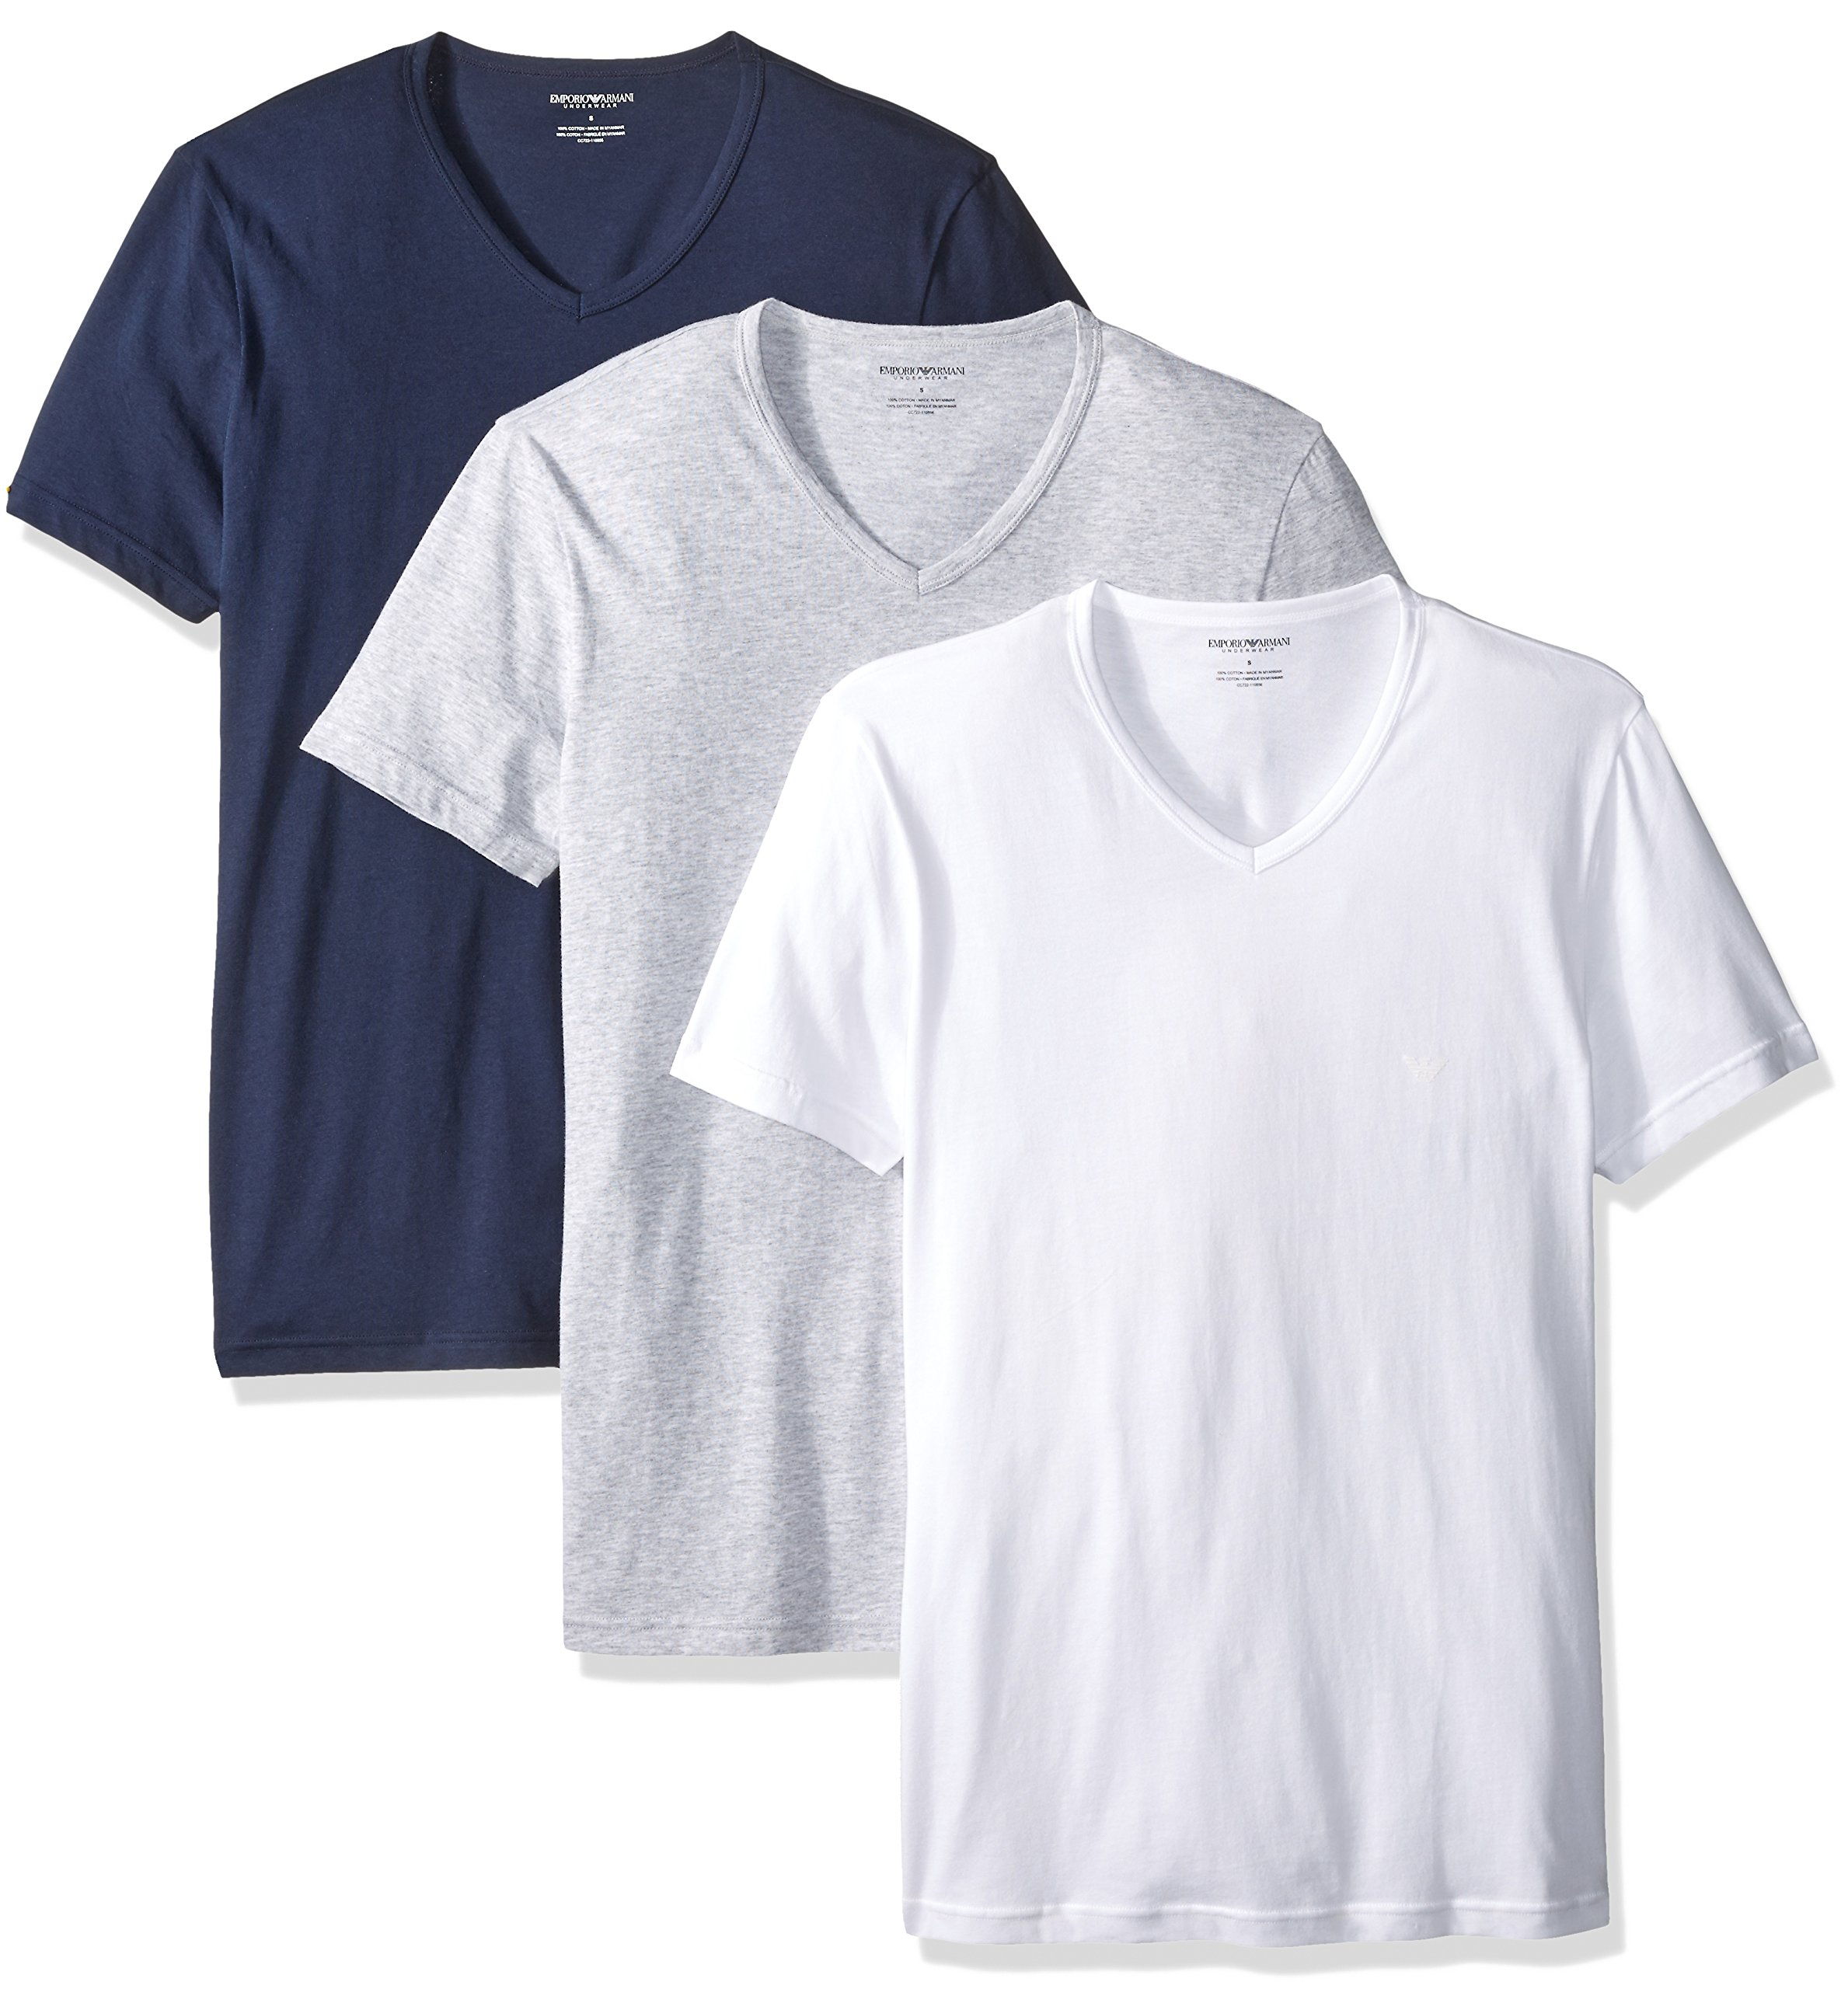 58ec9bdd9 Galleon - Emporio Armani Men's Cotton V-Neck Undershirts, 3-Pack, Grey/White /Navy, Small